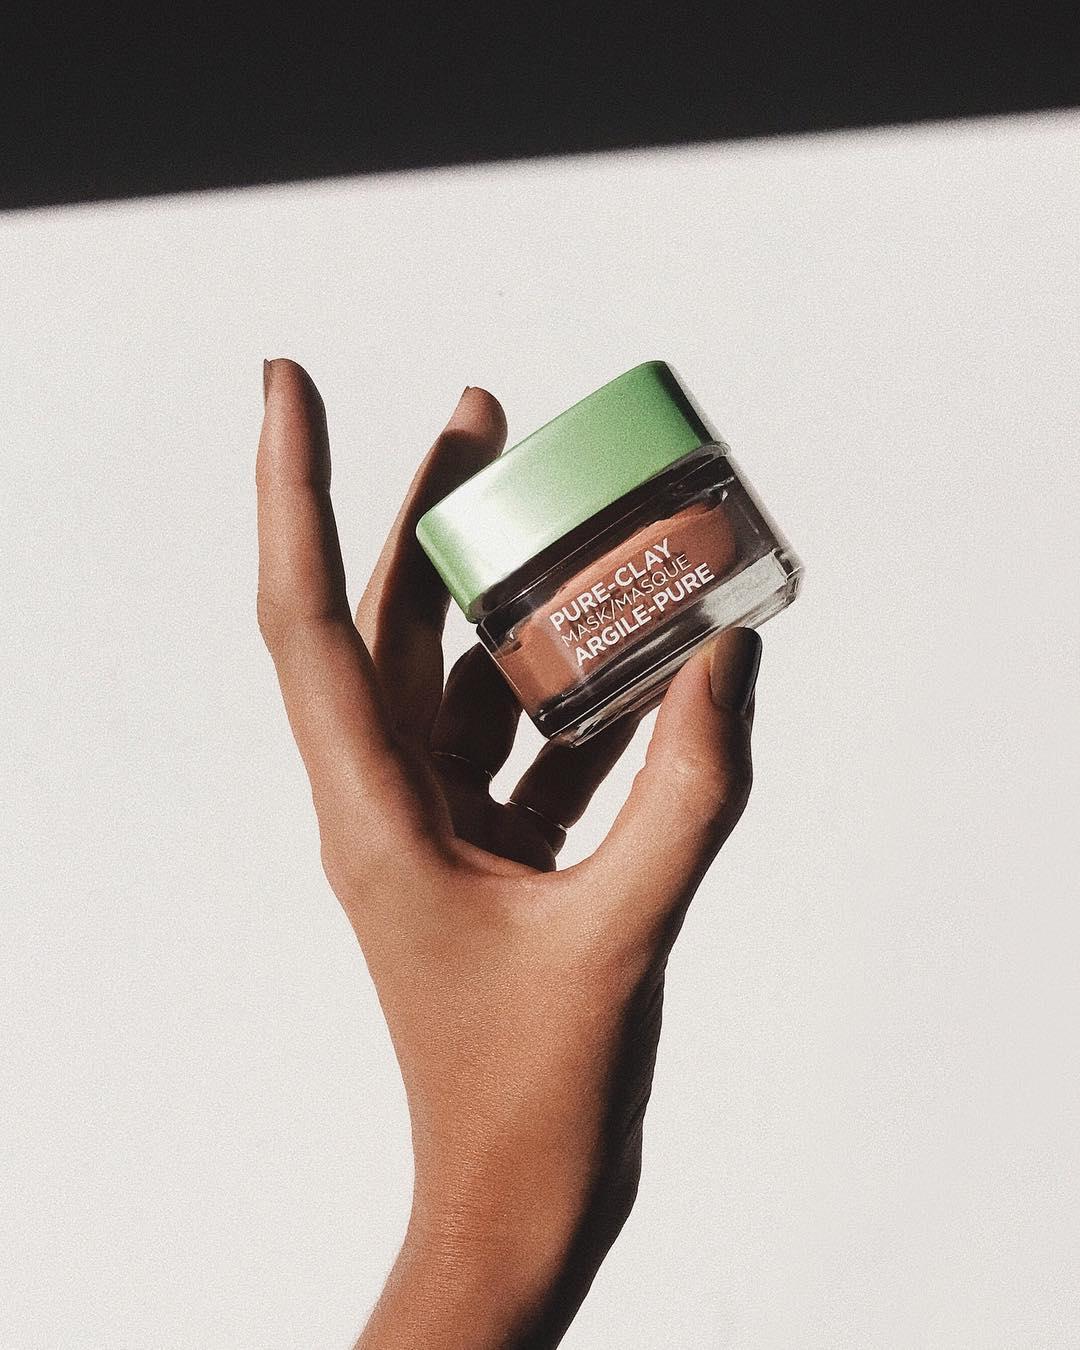 L'Oreal – Pure Clay Mask